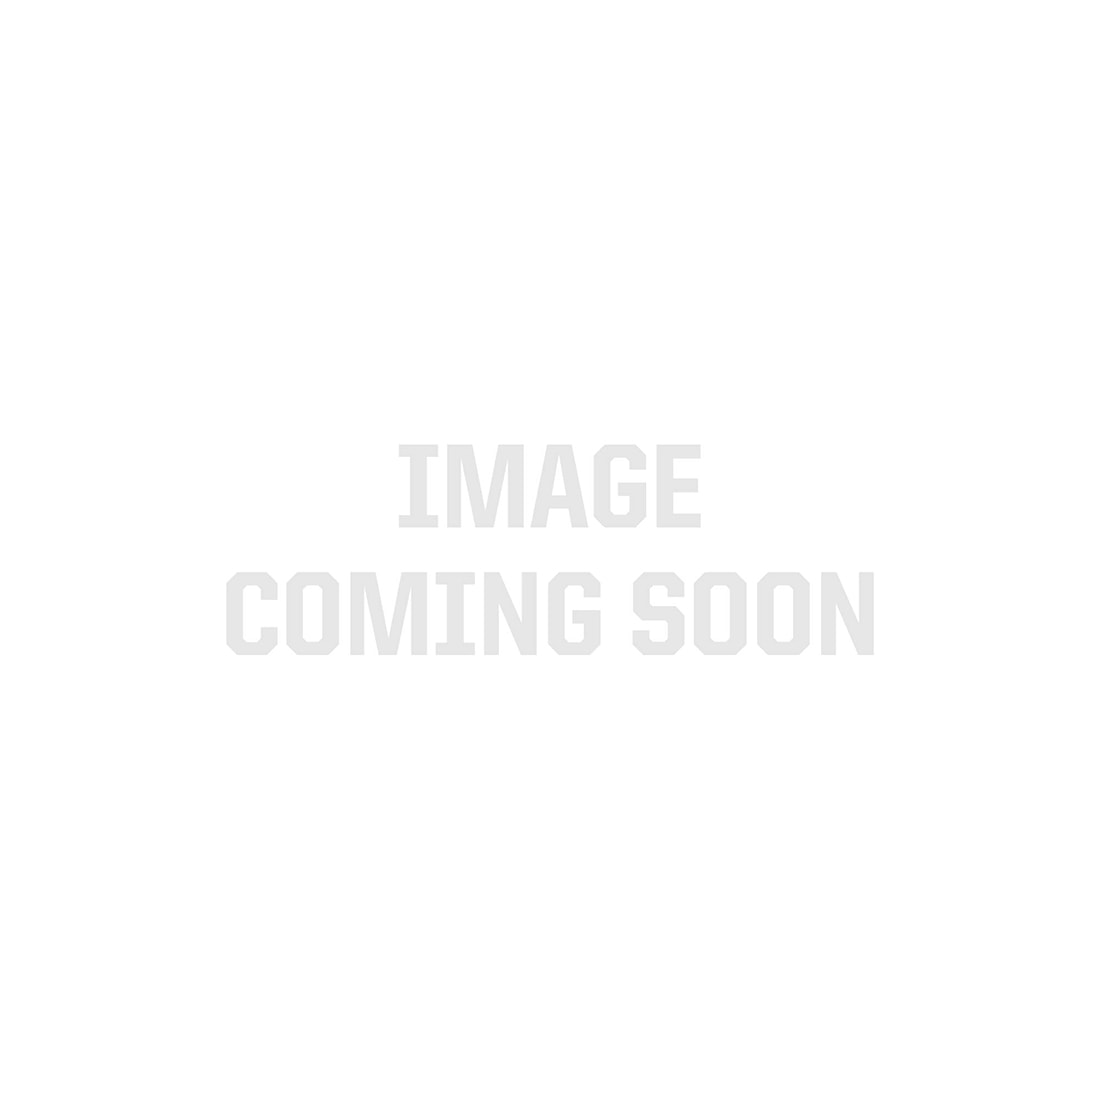 Soft White 3528 Single Row LED Strip Light, 240/m, 10mm wide, Sample Kit